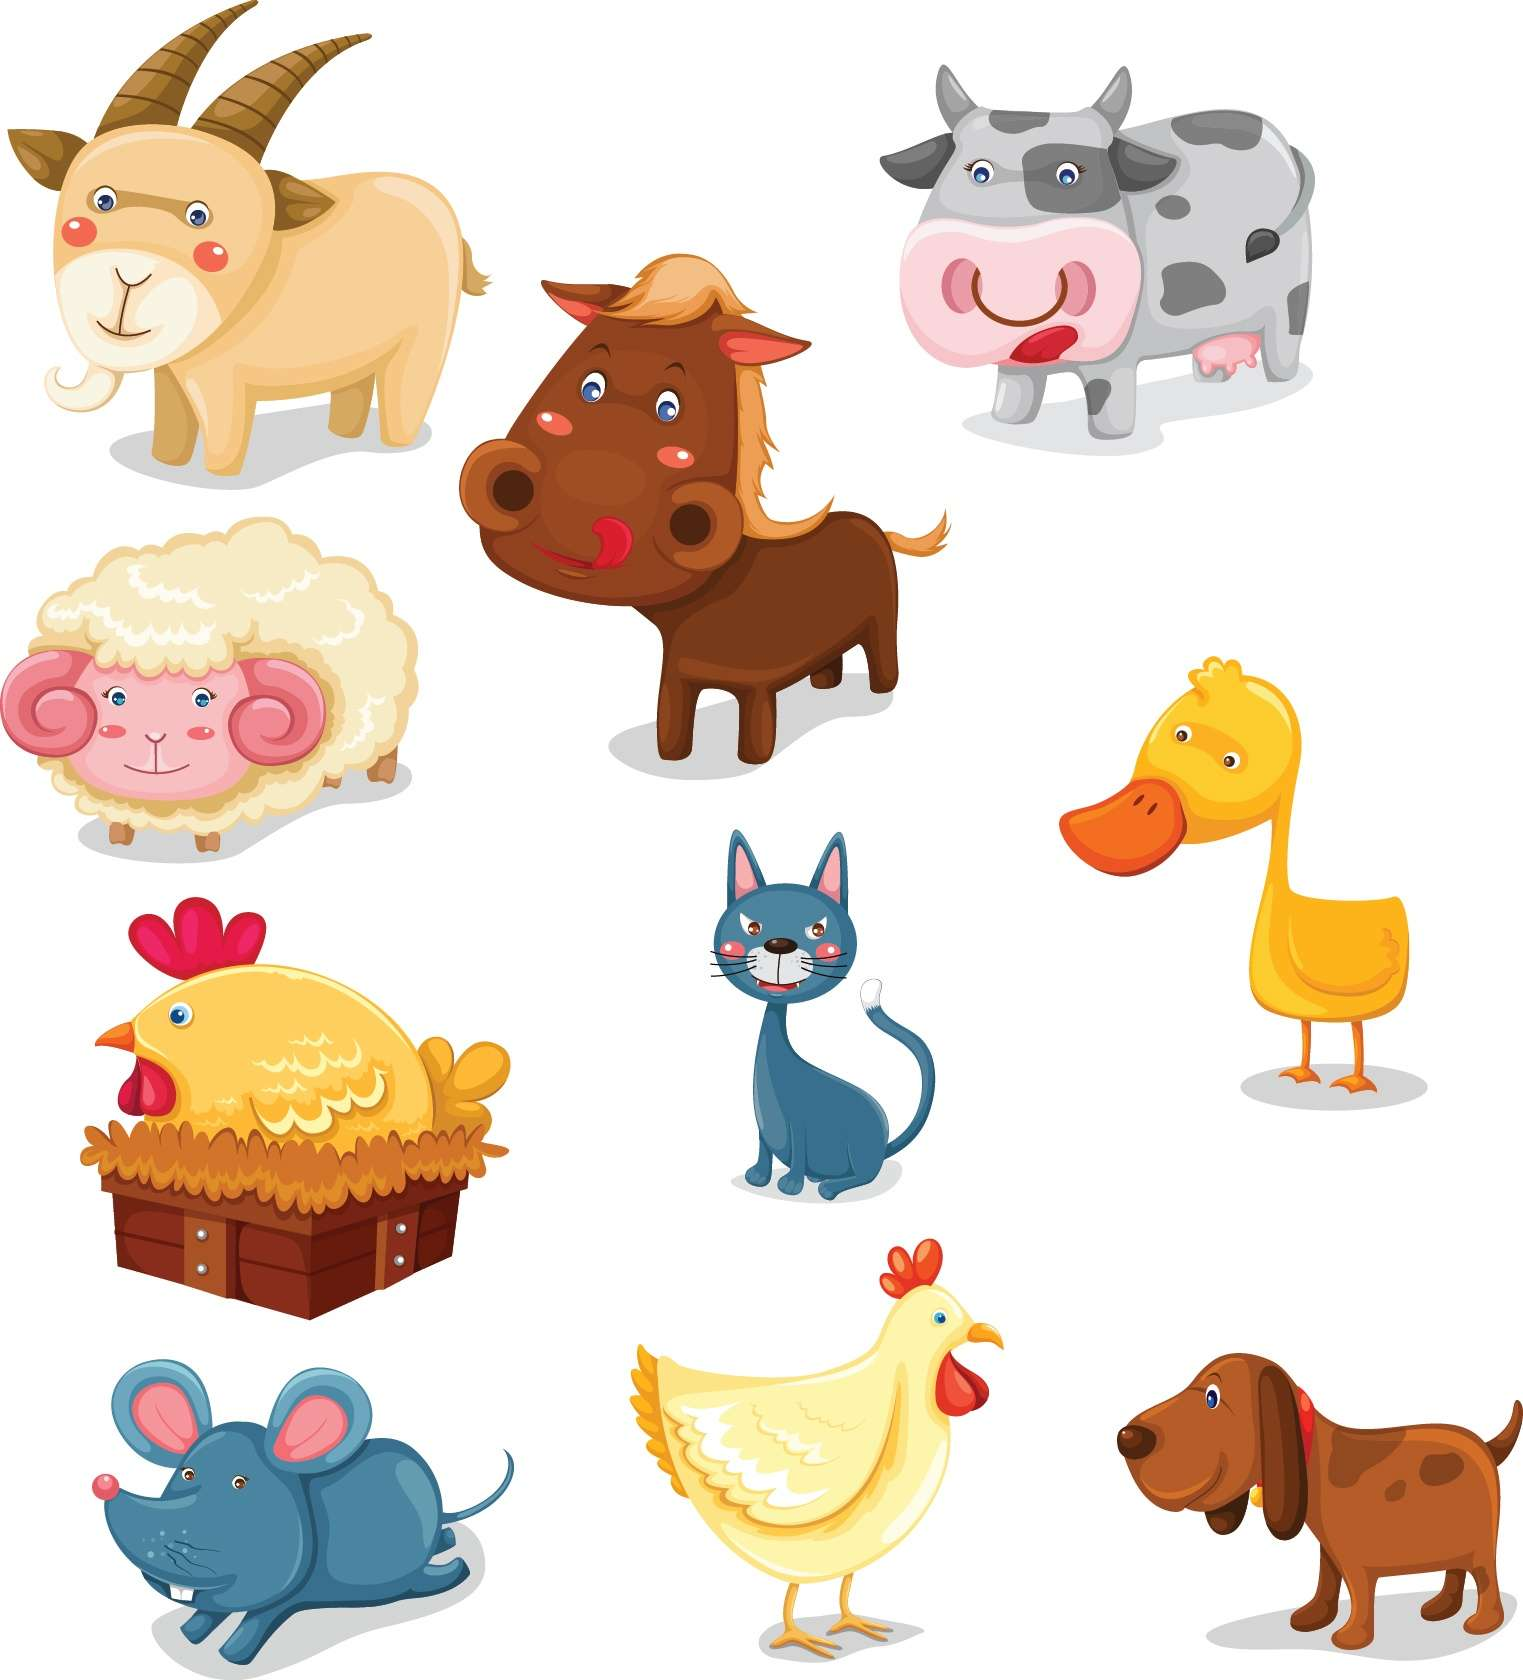 Cute cartoon animals 02 png